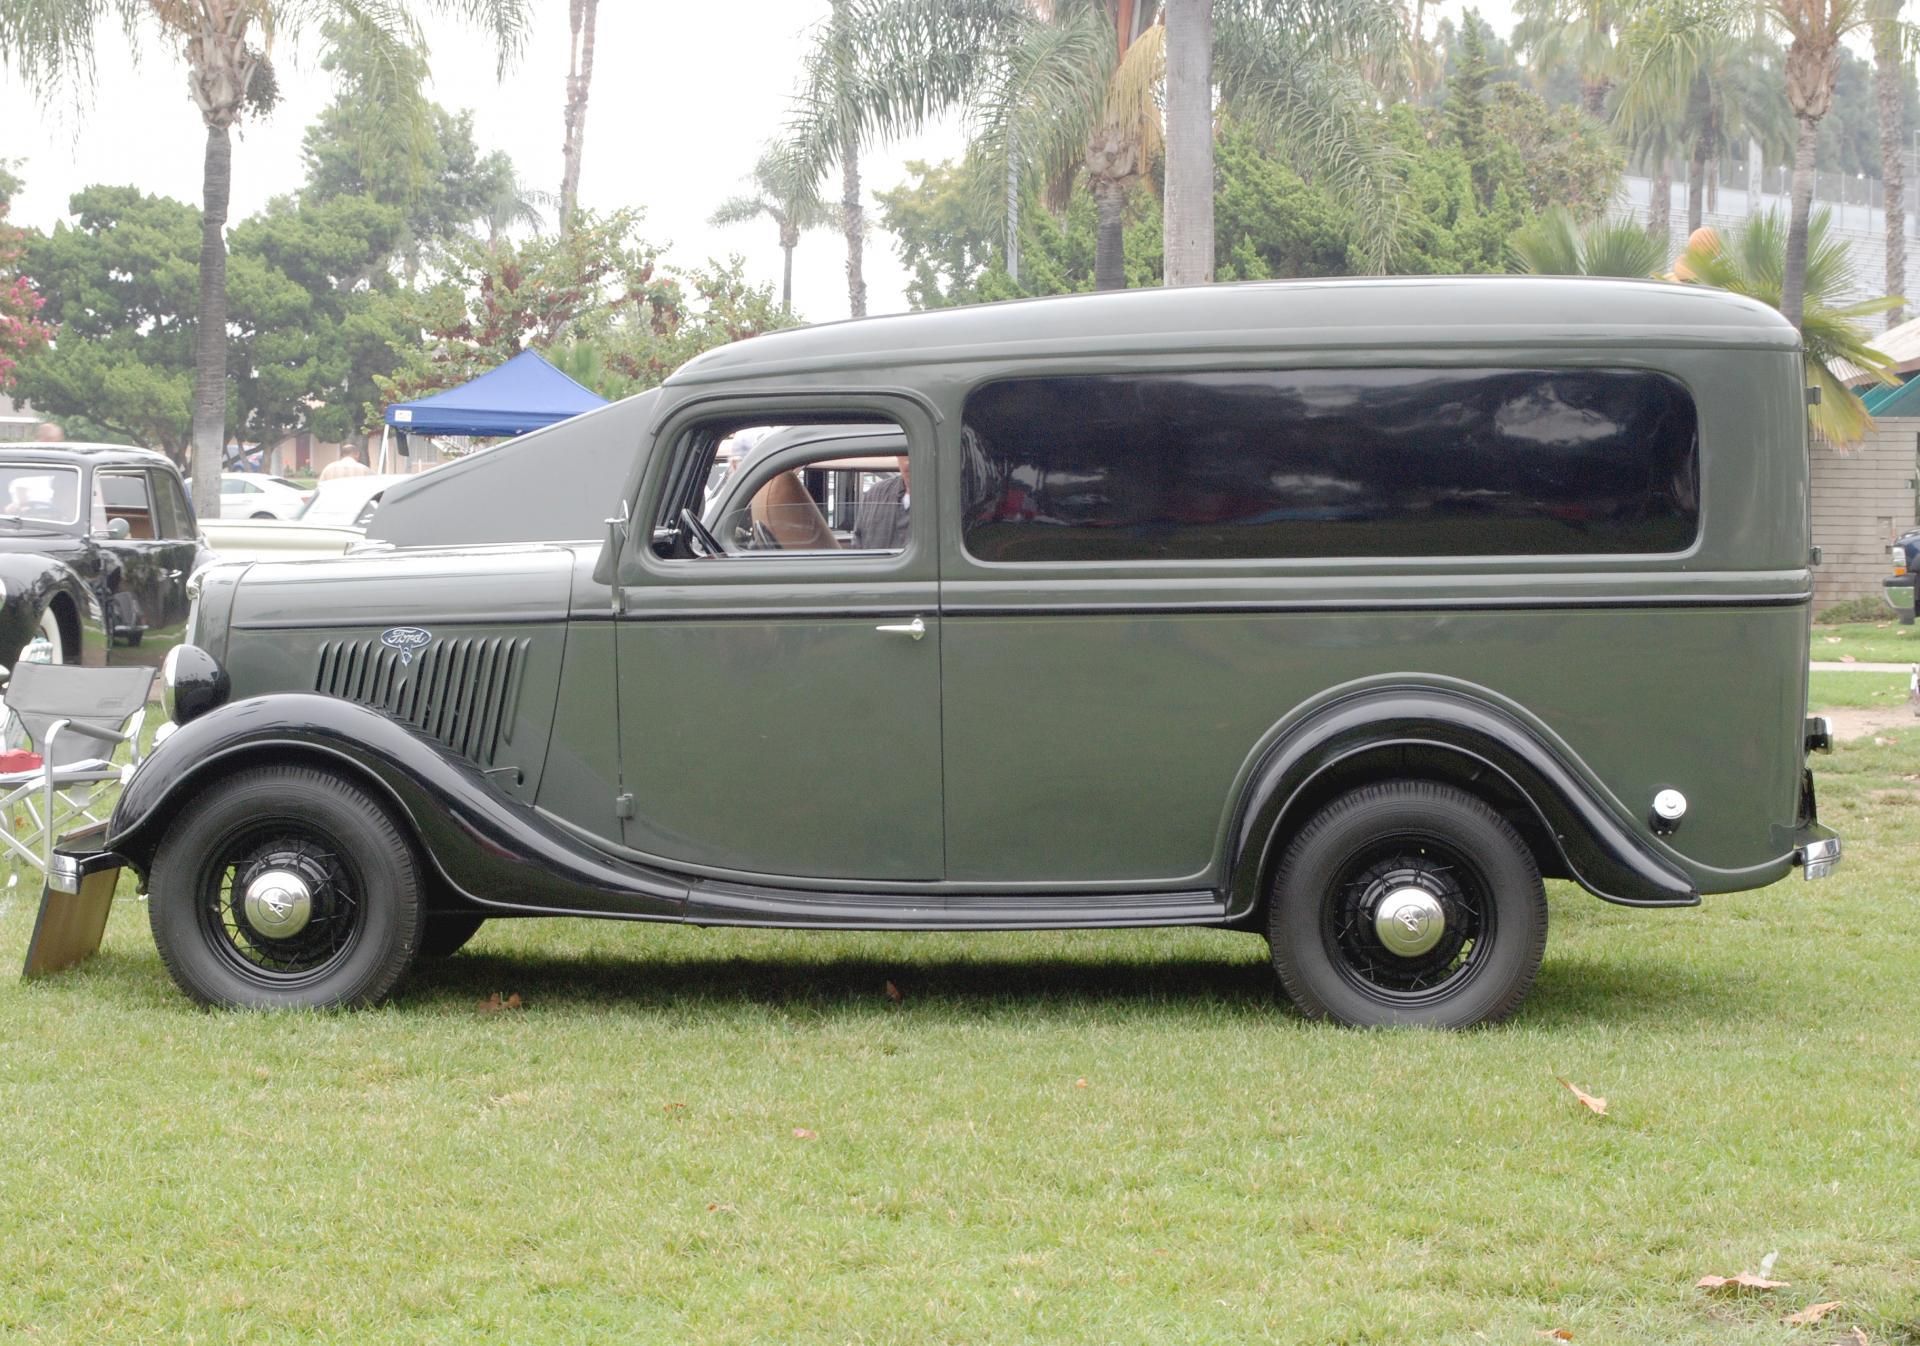 Ford 1935 panel truck side lf.JPG